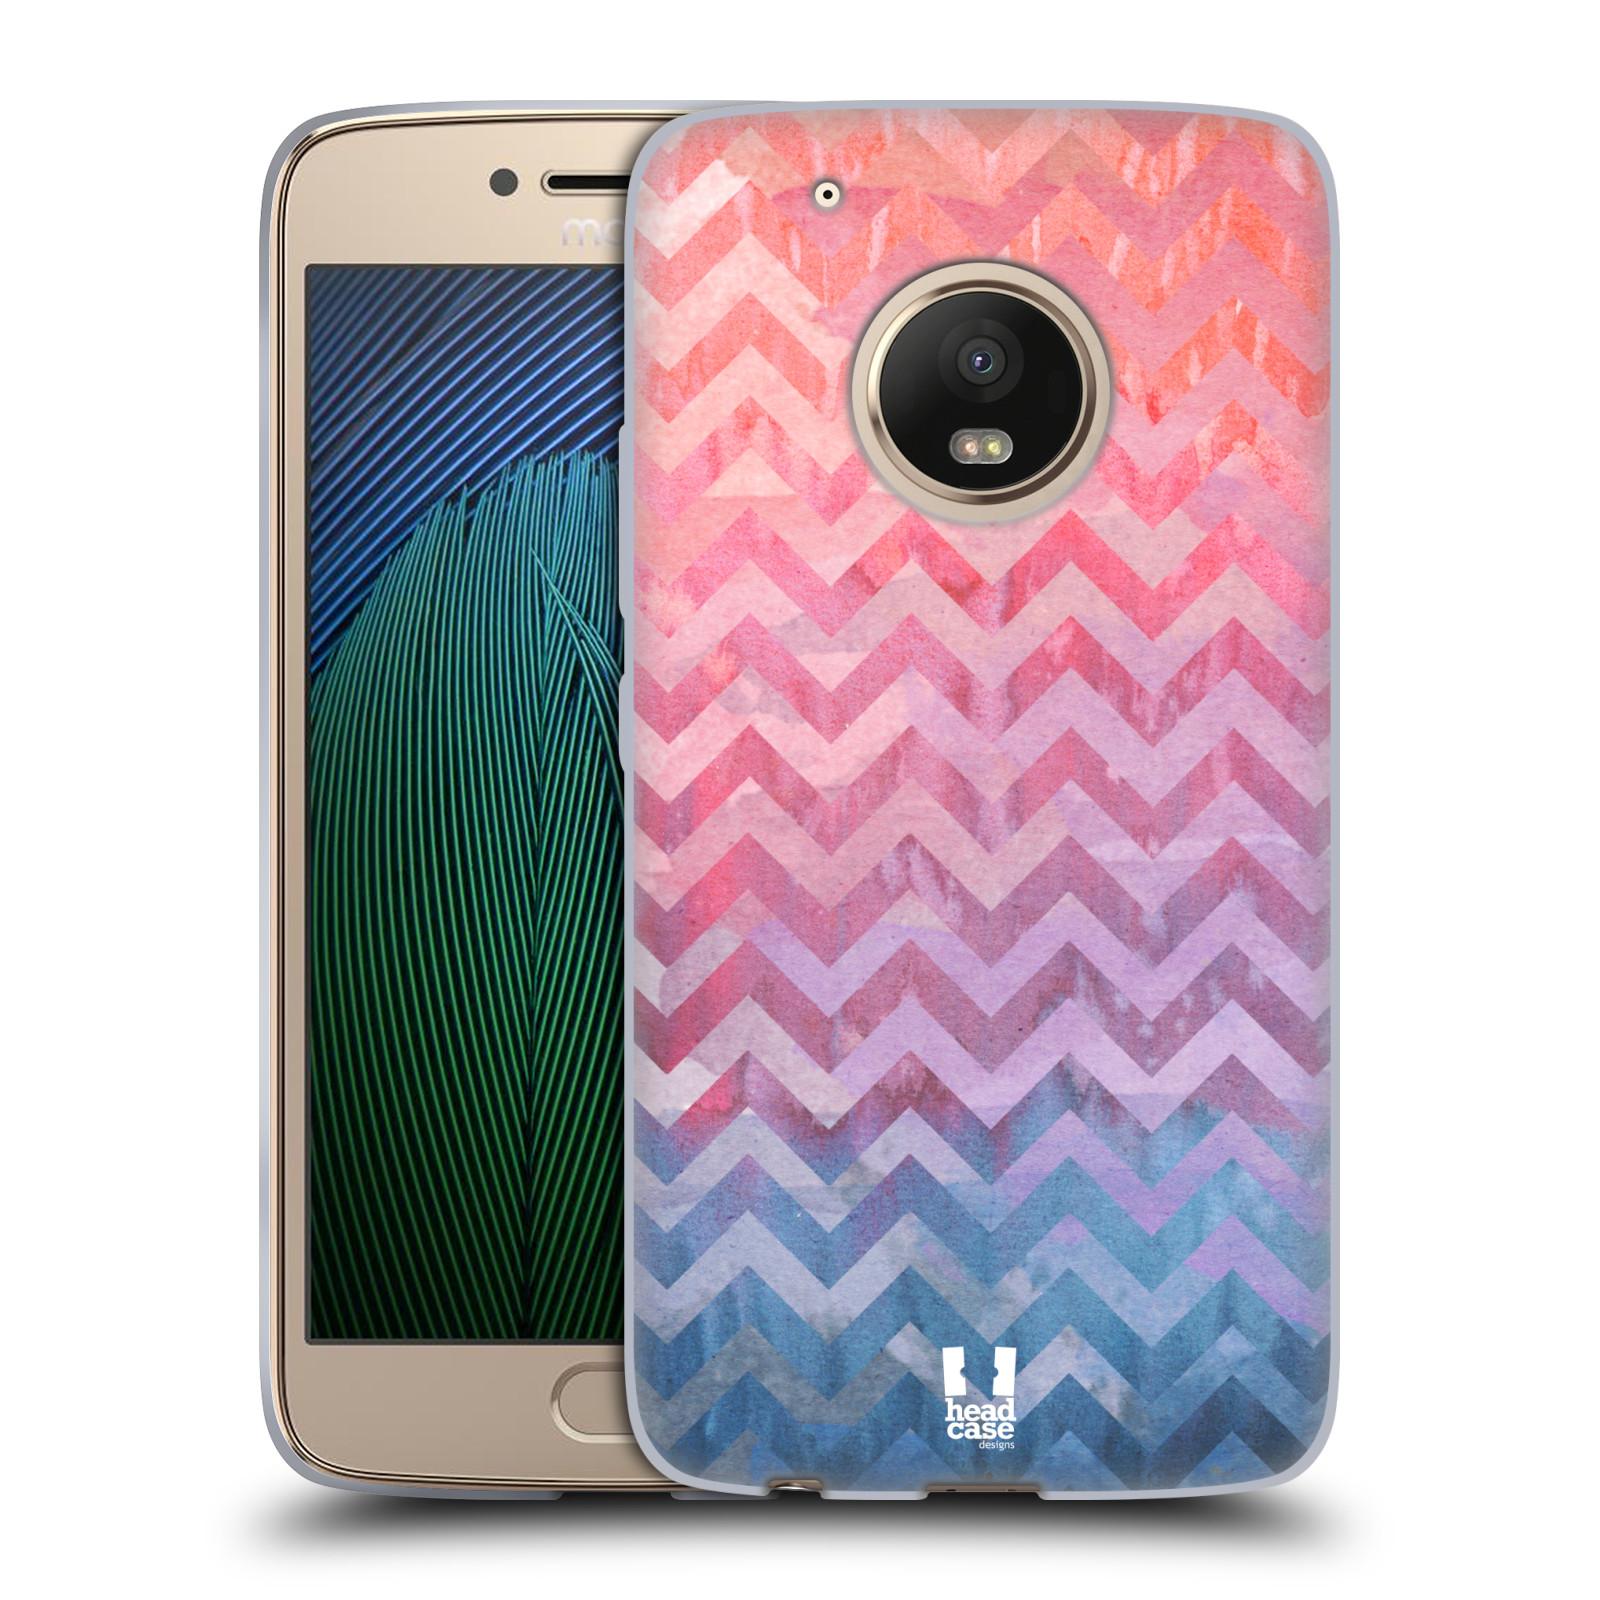 Silikonové pouzdro na mobil Lenovo Moto G5 Plus - Head Case Pink Chevron (Silikonový kryt či obal na mobilní telefon Lenovo Moto G5 Plus)